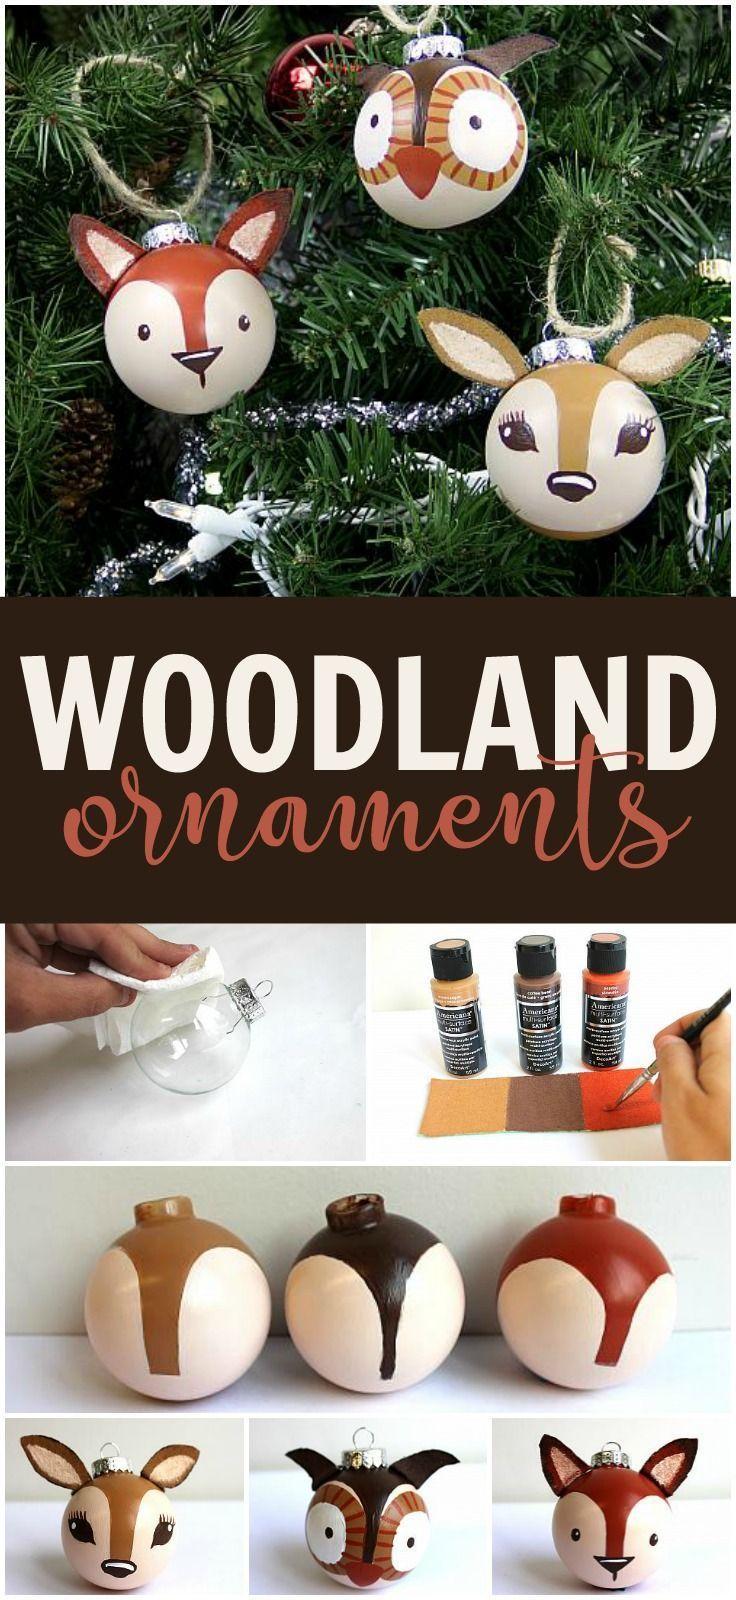 Turn a plain round ornament into a cute woodland creature easily with Americana®️ Multi-Surface Acrylics. @DecoArt #decoartprojects #decoartprojects